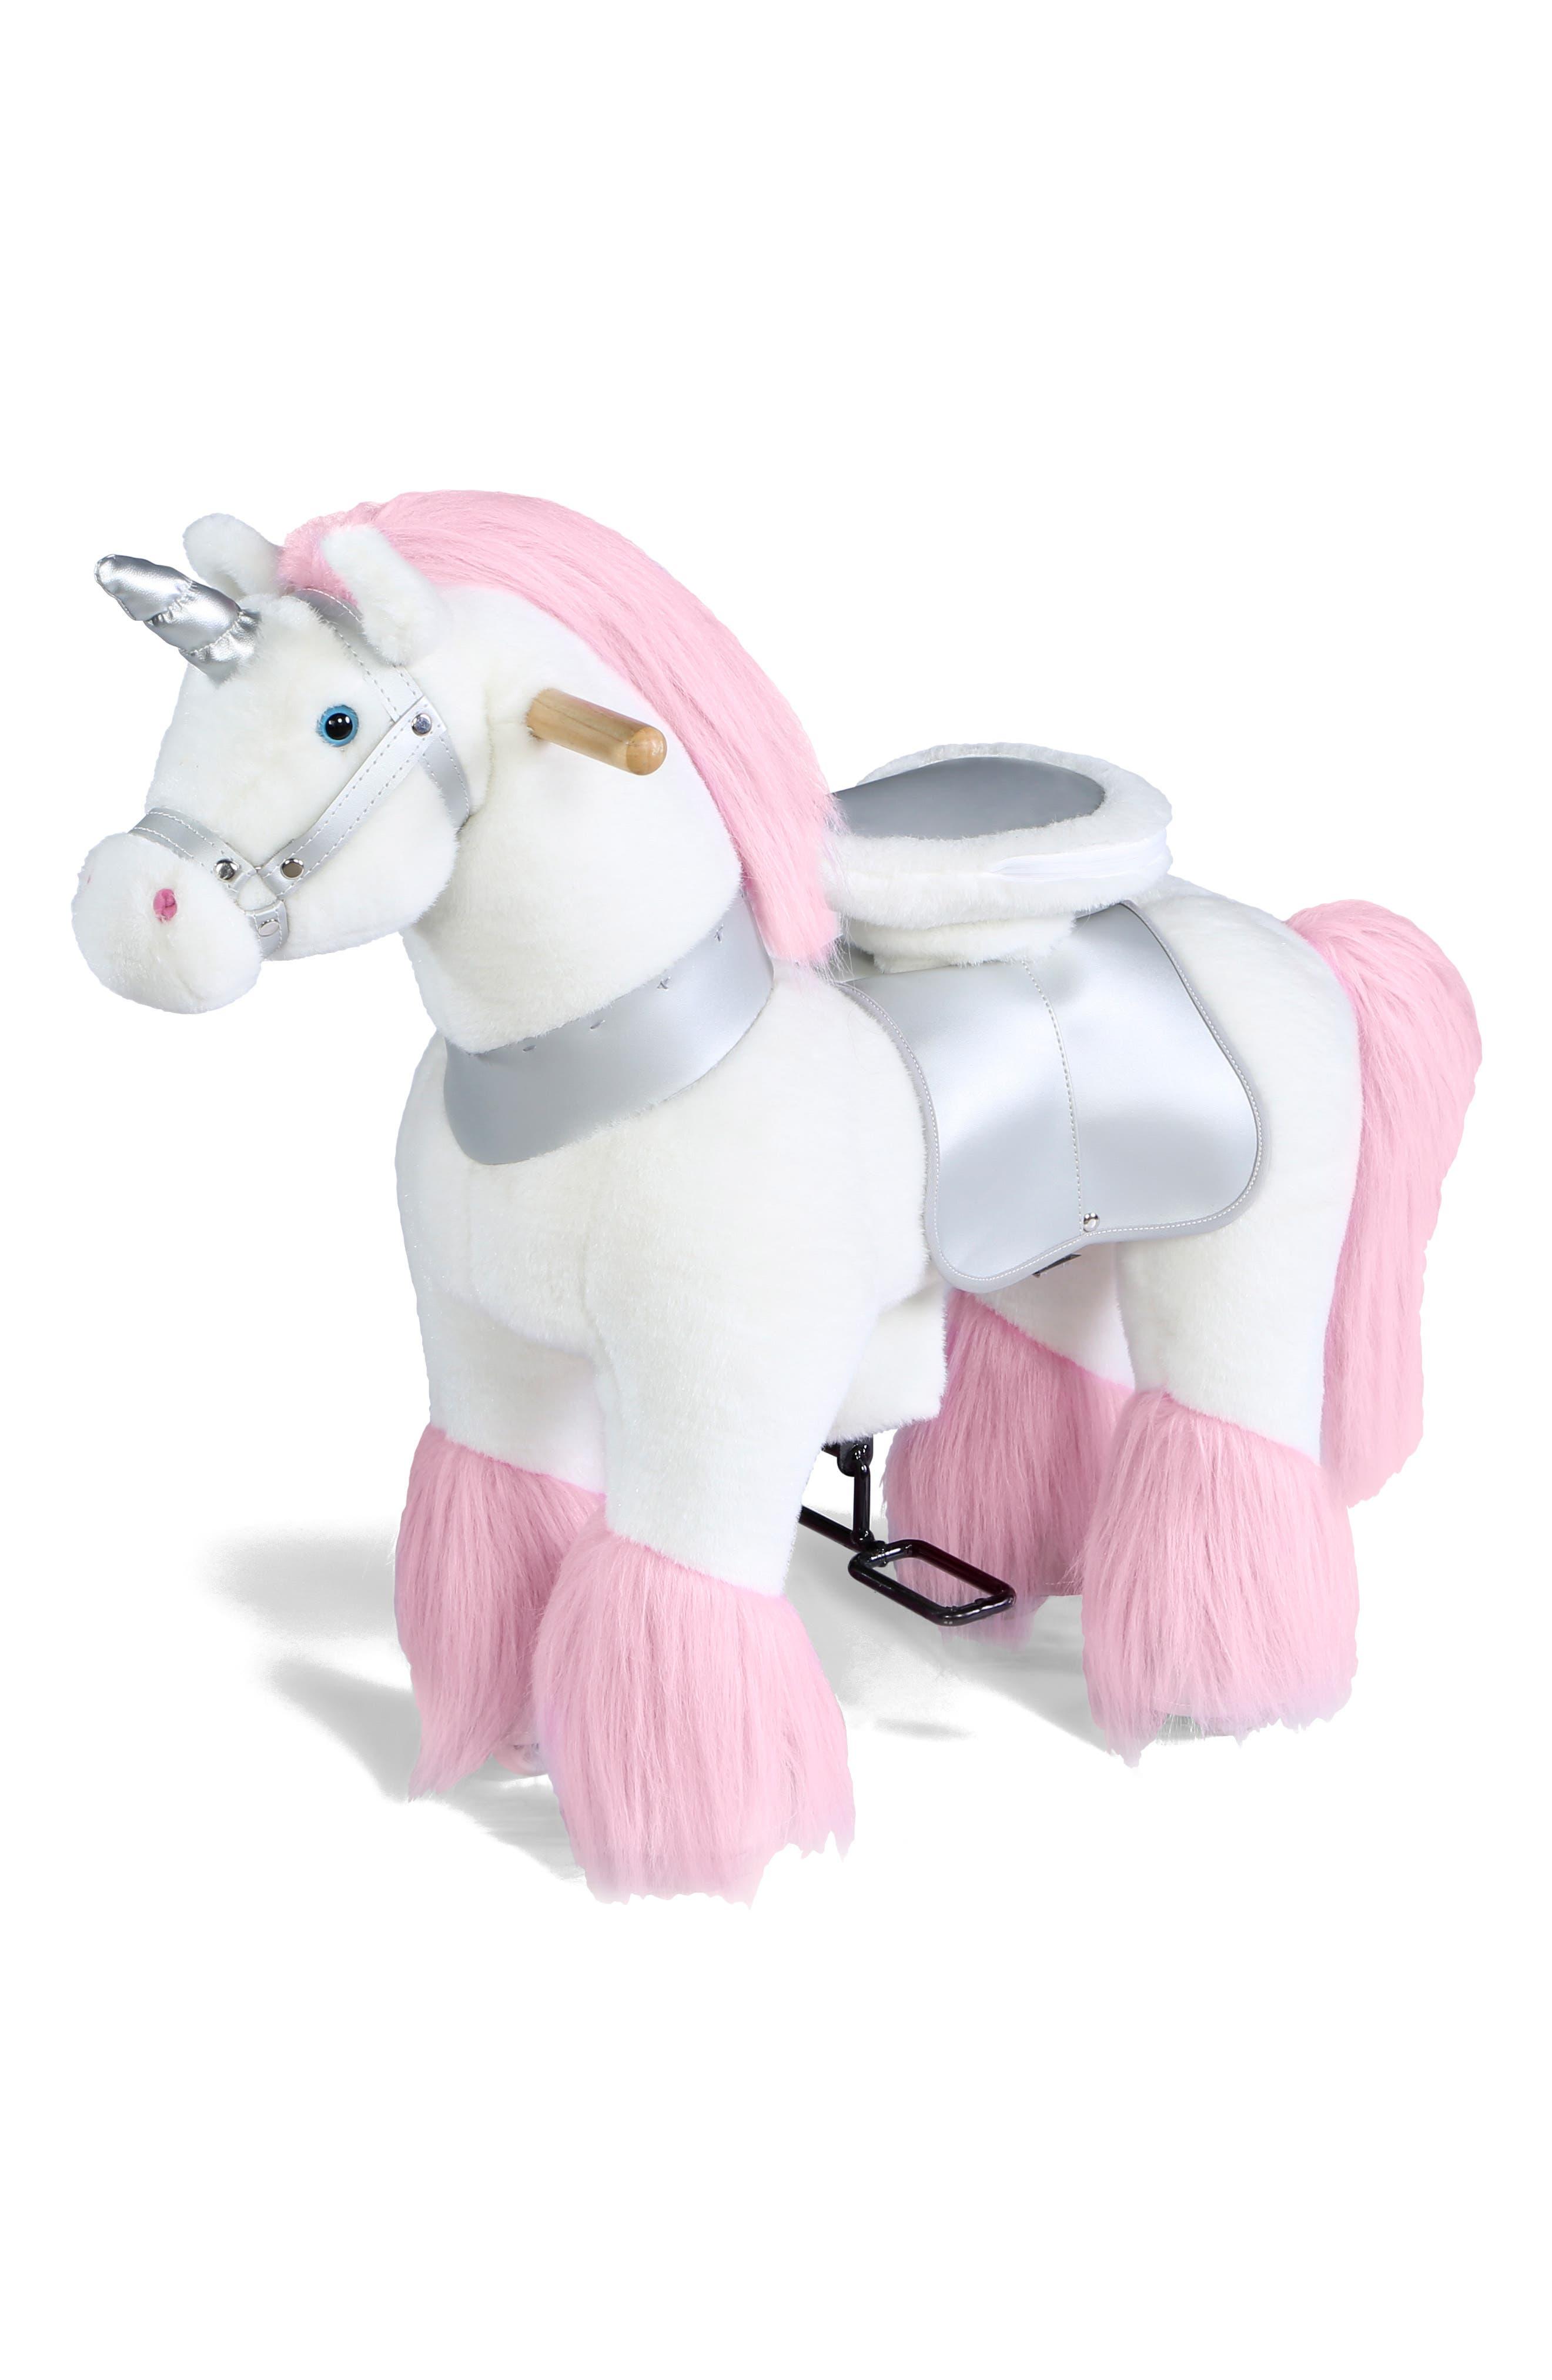 Plush Ride-On Unicorn Toy,                         Main,                         color, 100